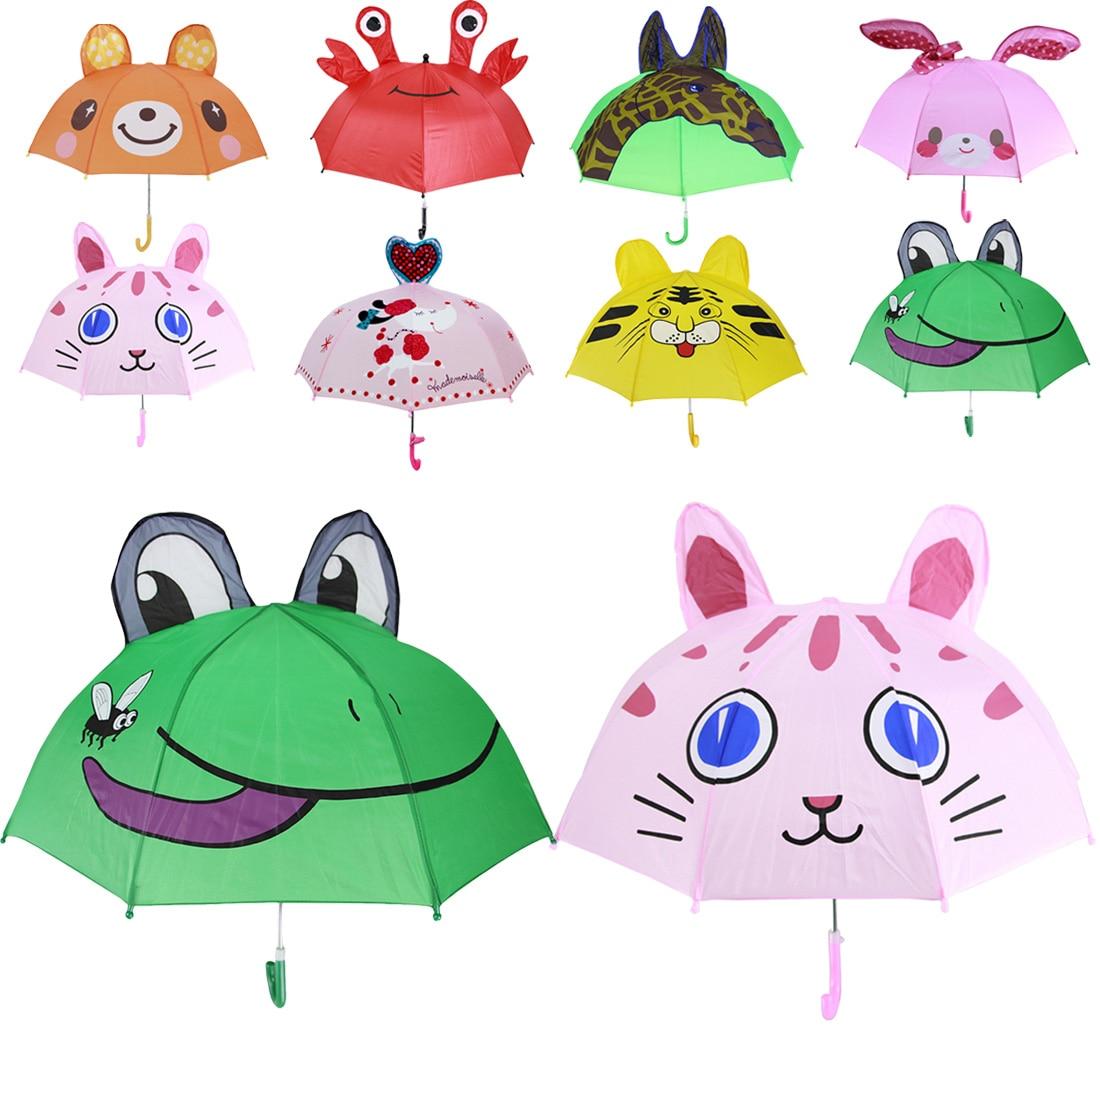 Child 3DCartoon Pop-up Ear Dome Umbrellas Brolly Kids Tiger/&Monkey Rain Umbrella